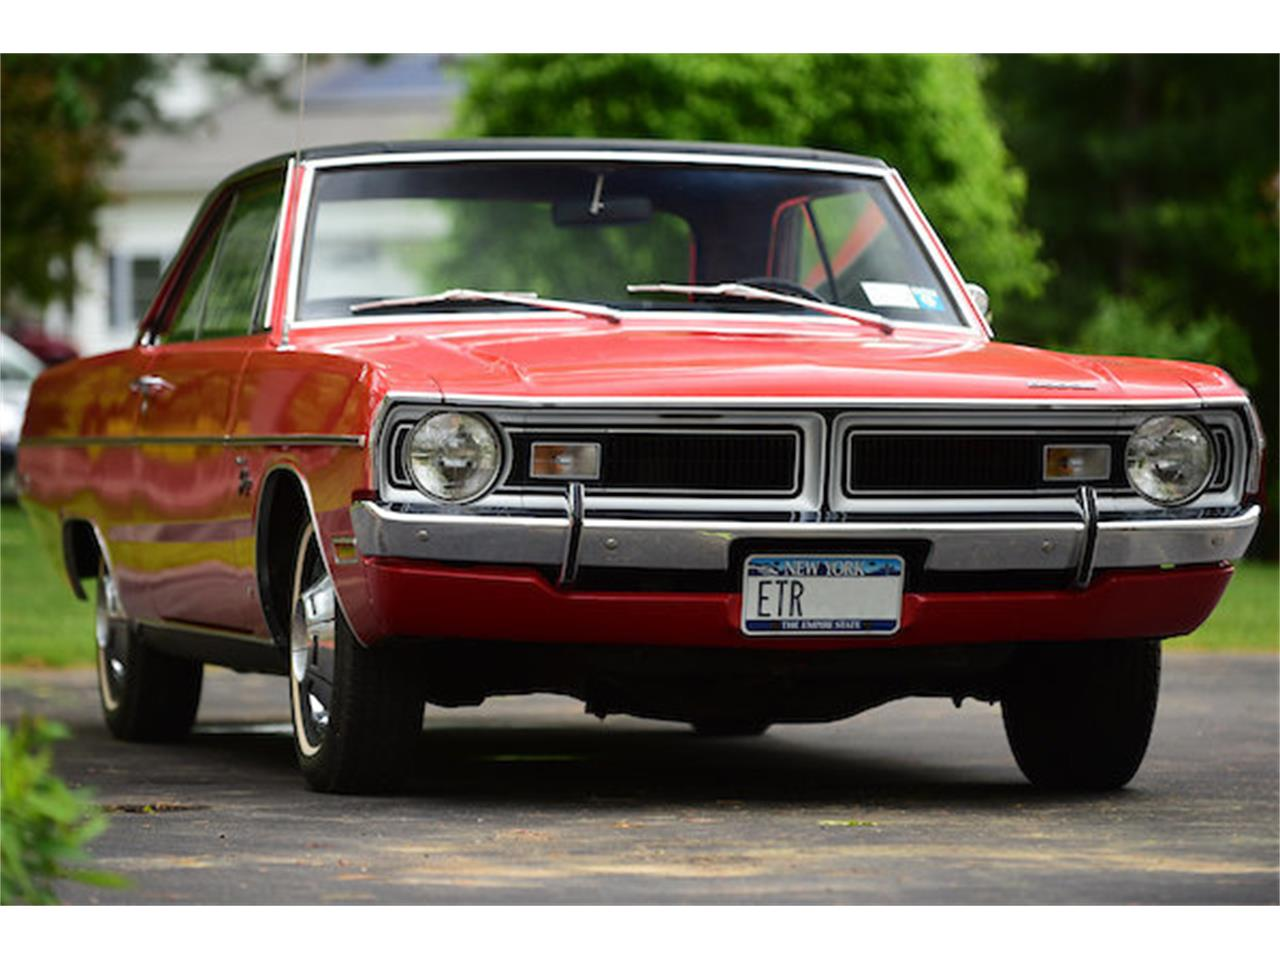 Classic Dodge Dart for Sale on ClassicCars.com